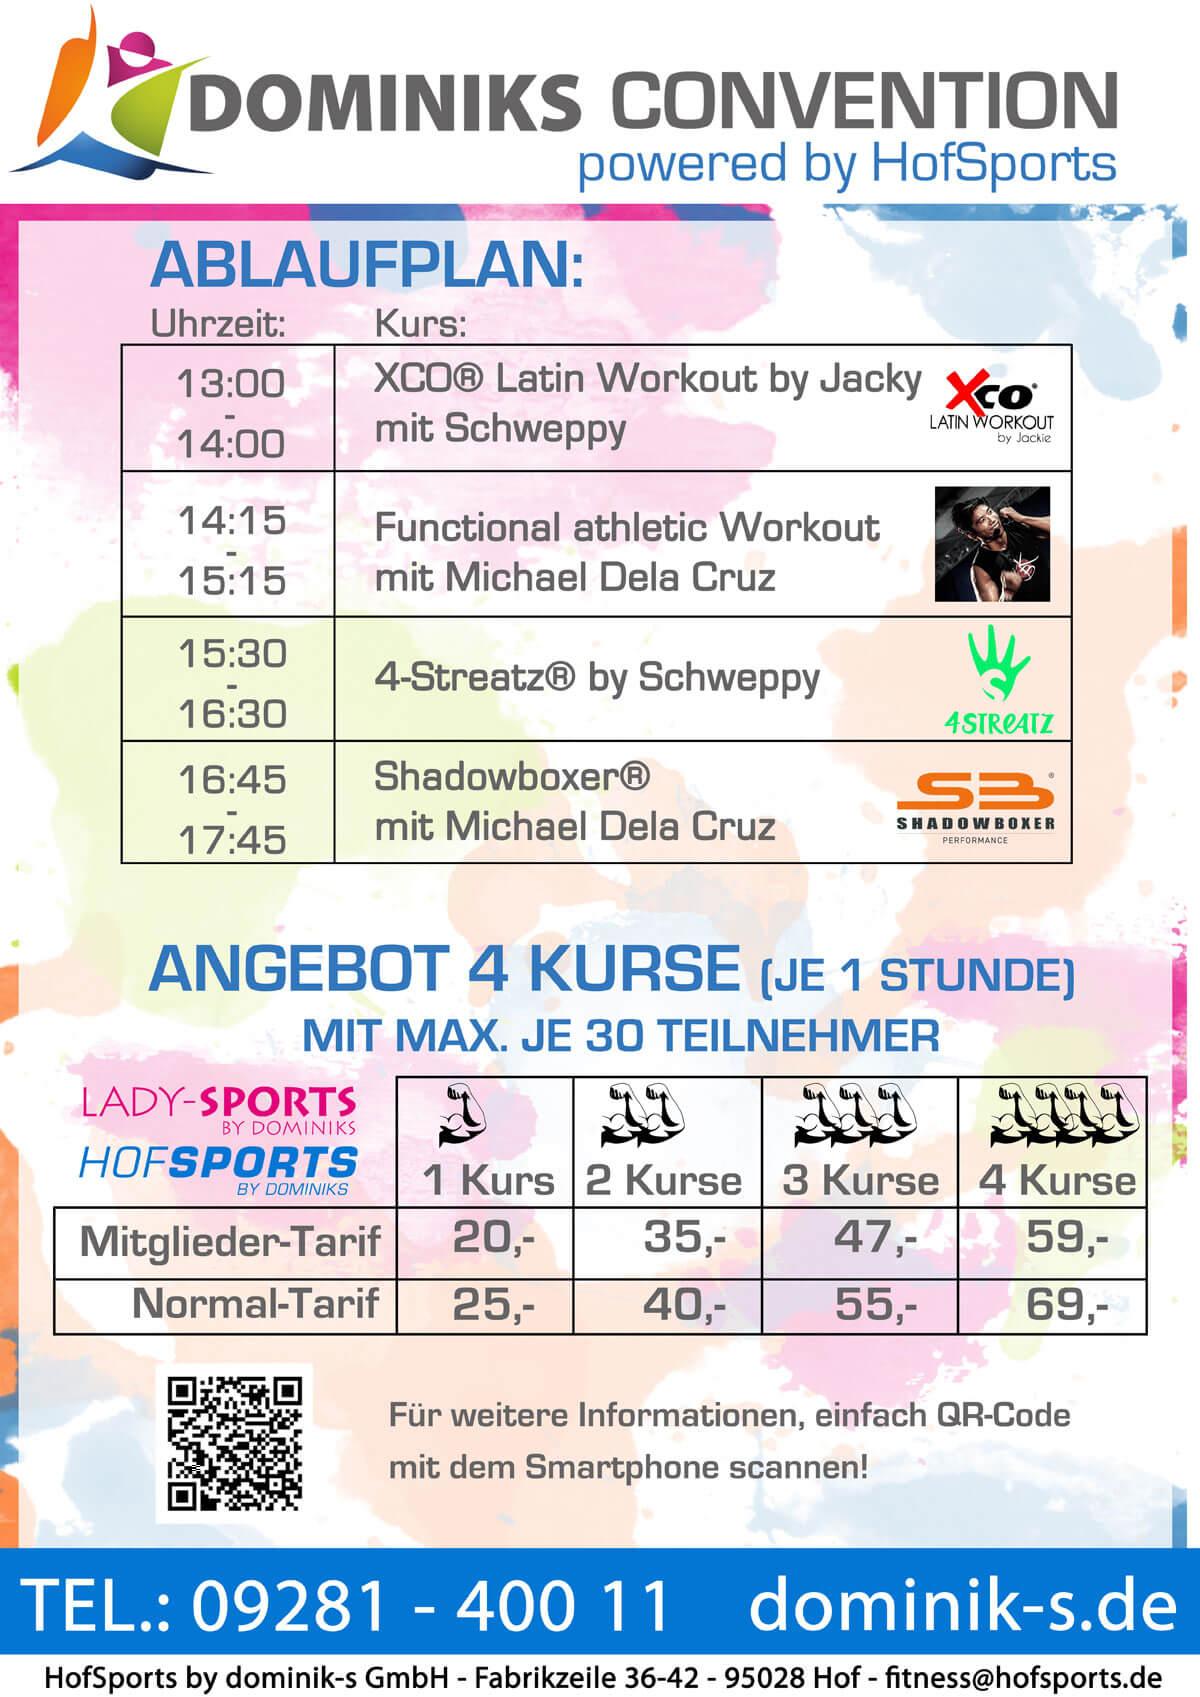 Ablaufplan Convention HofSports